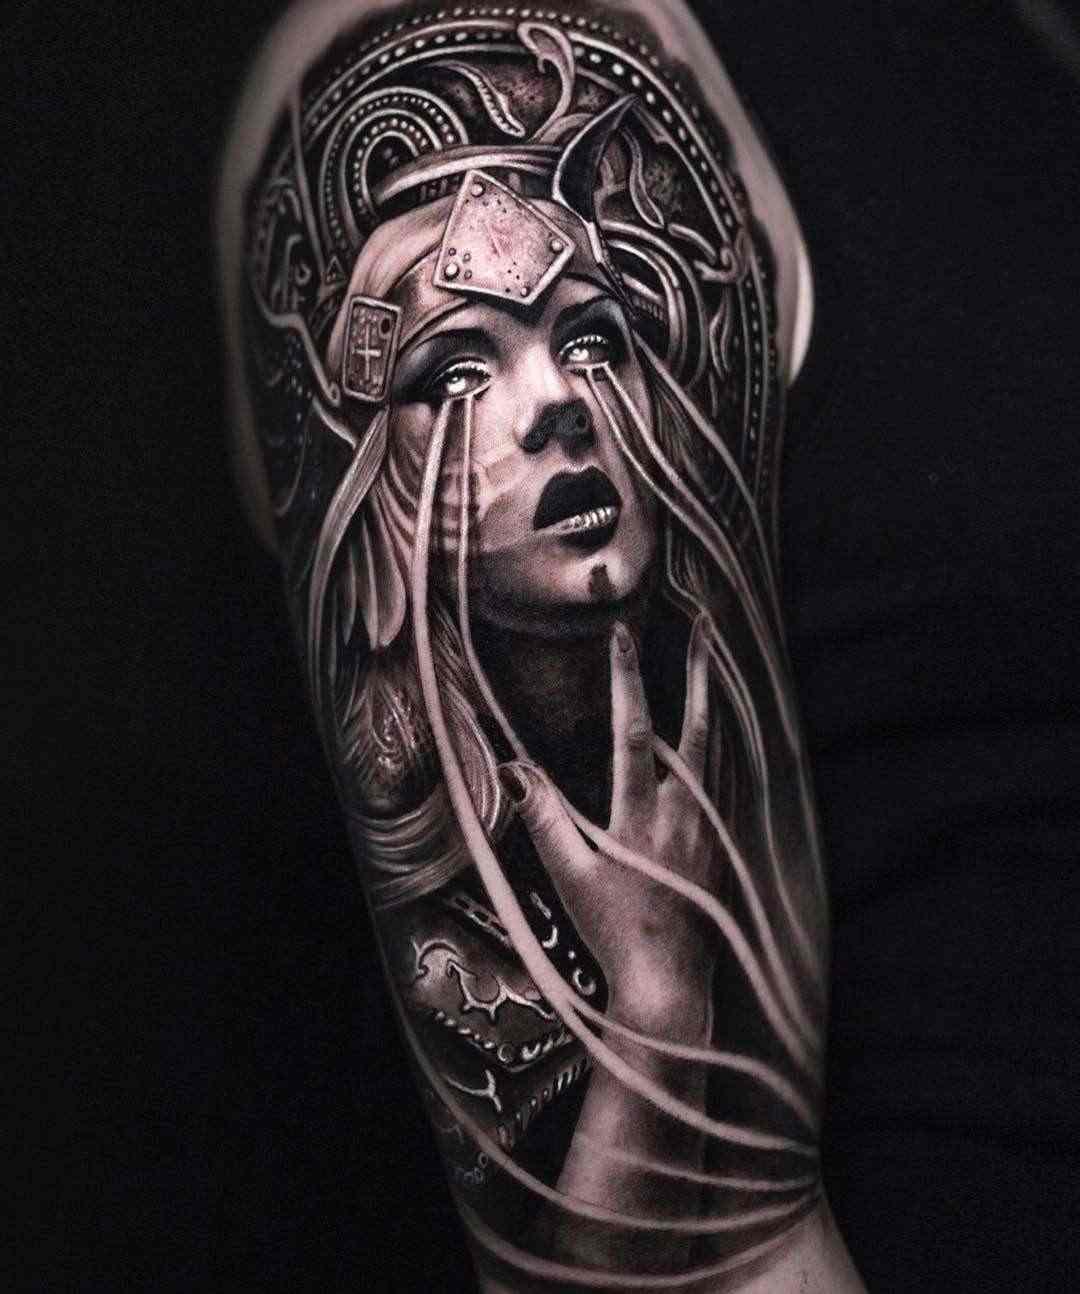 Espectacular tatuaje e blanco y negro